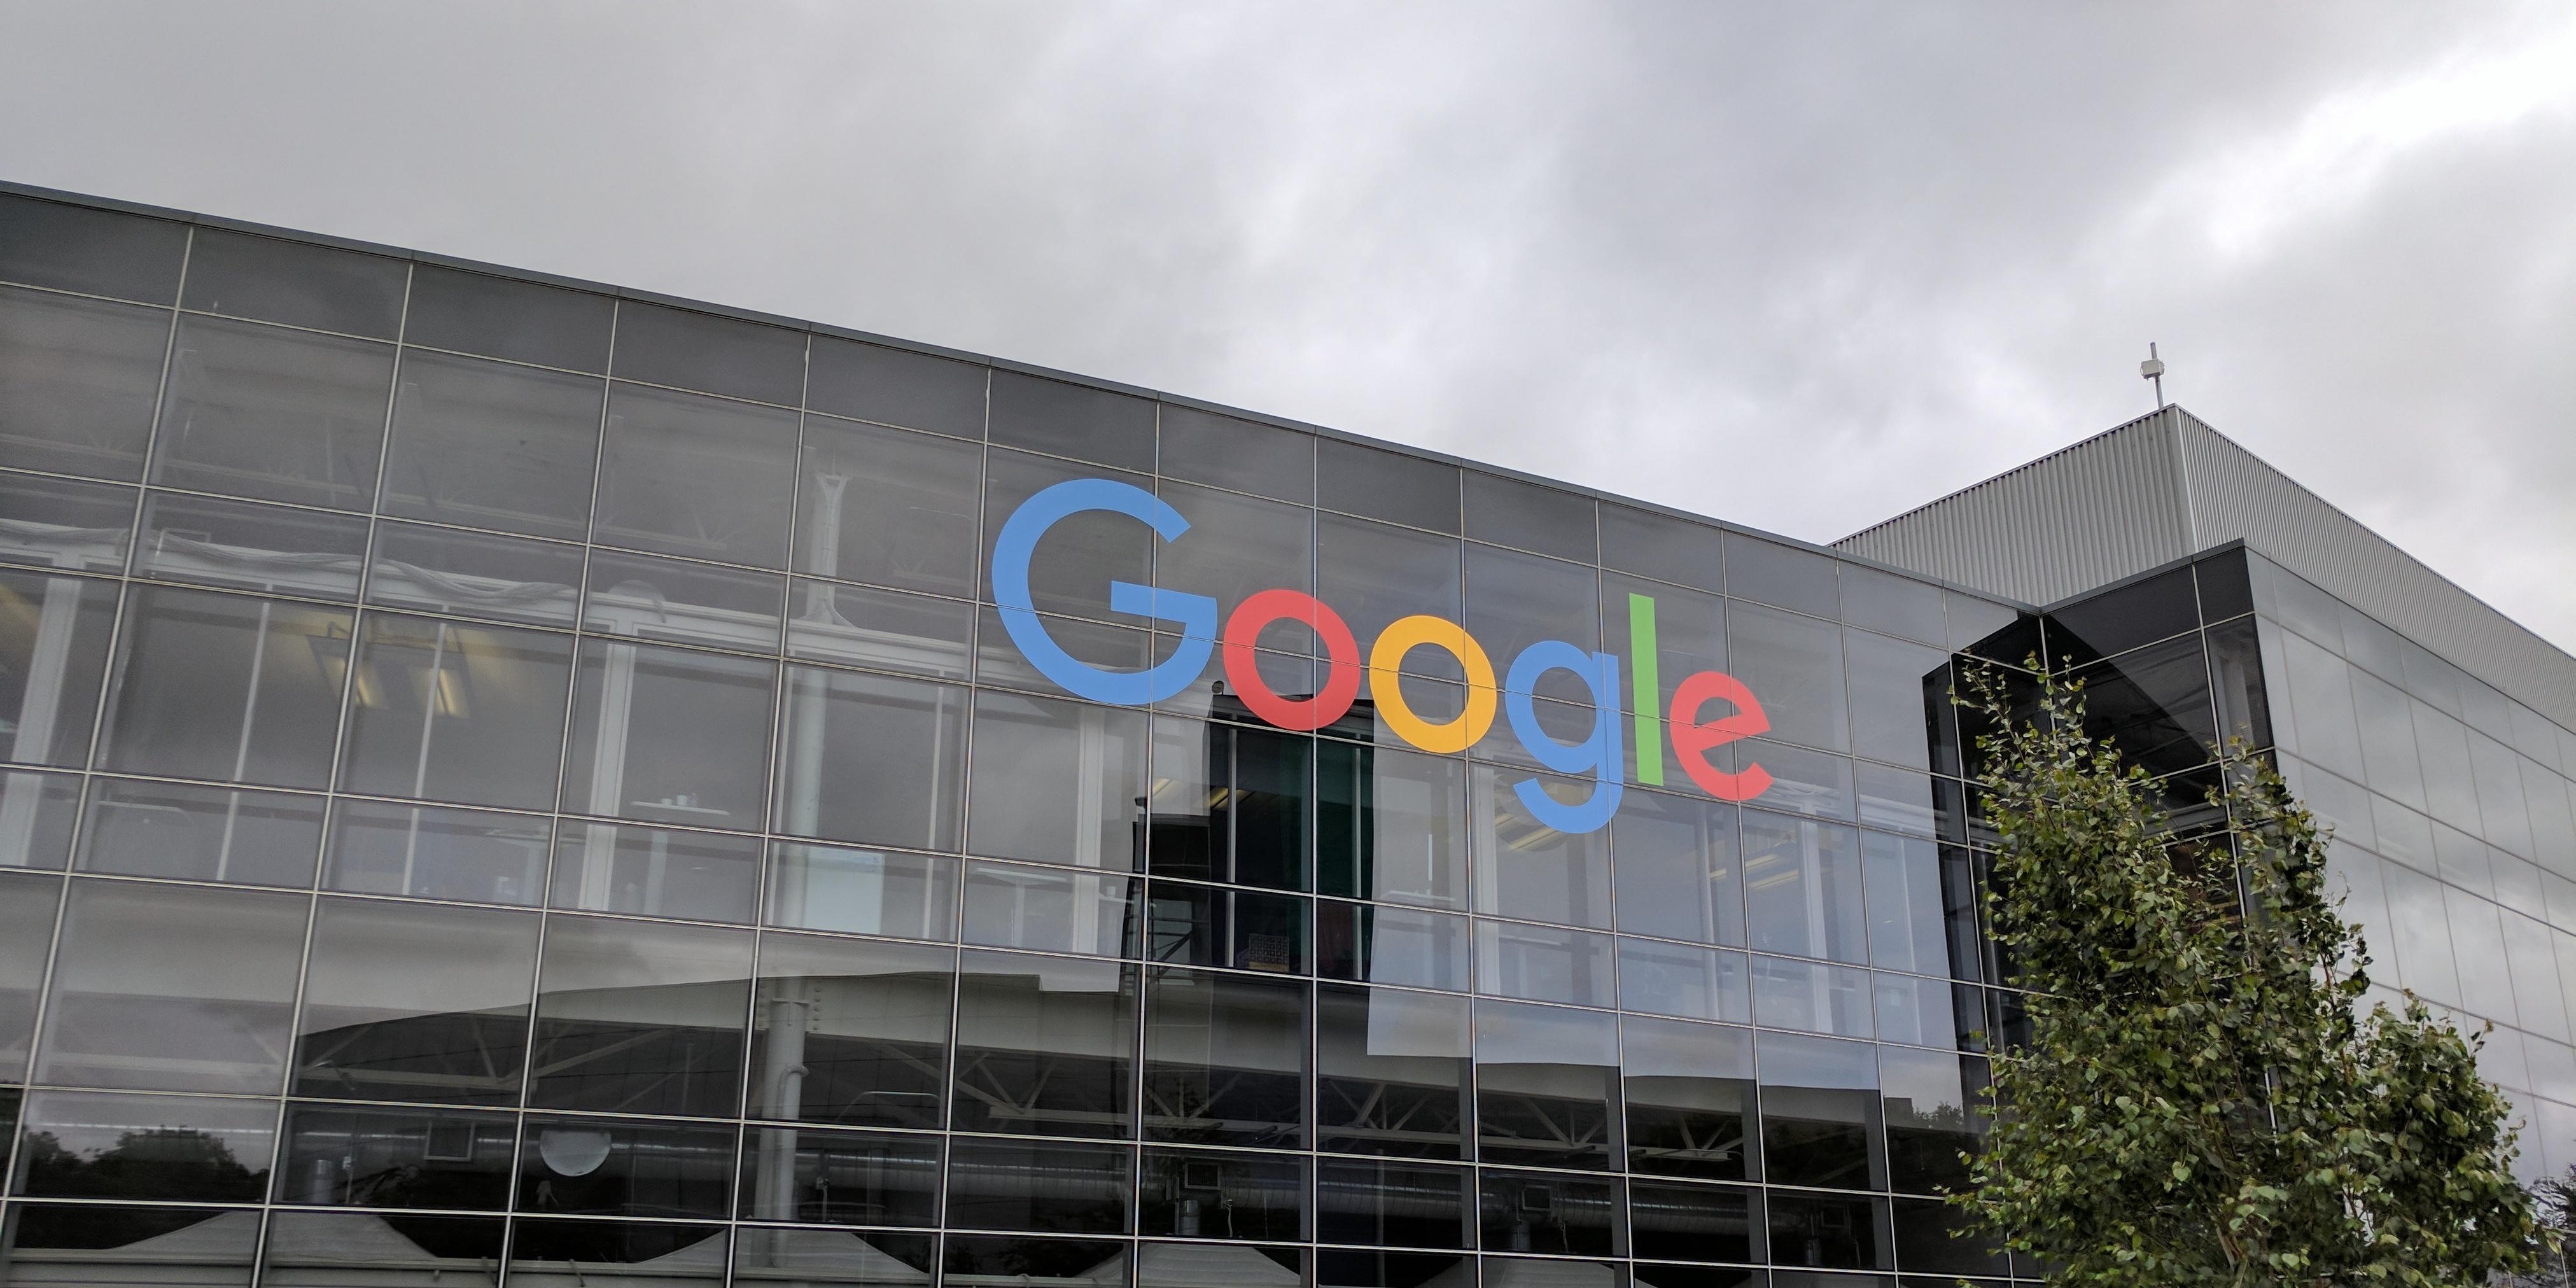 Berichten zufolge hält Google die Dragonfly-Entwicklung wegen zensierter Suche nach Beschwerden des Datenschutzteams an